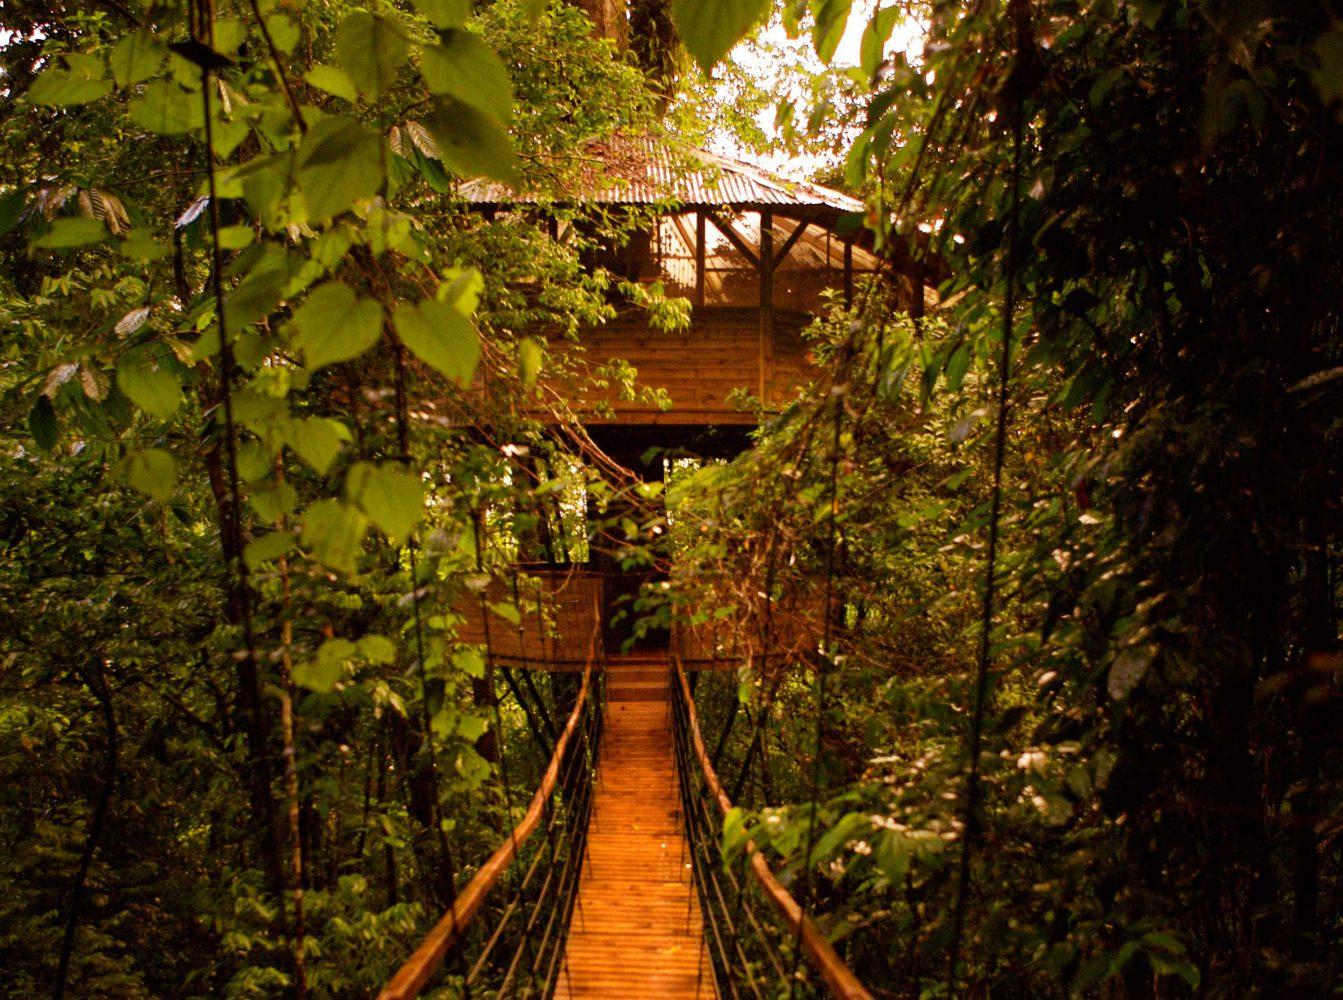 Finca Bellavista: A Tree House Community